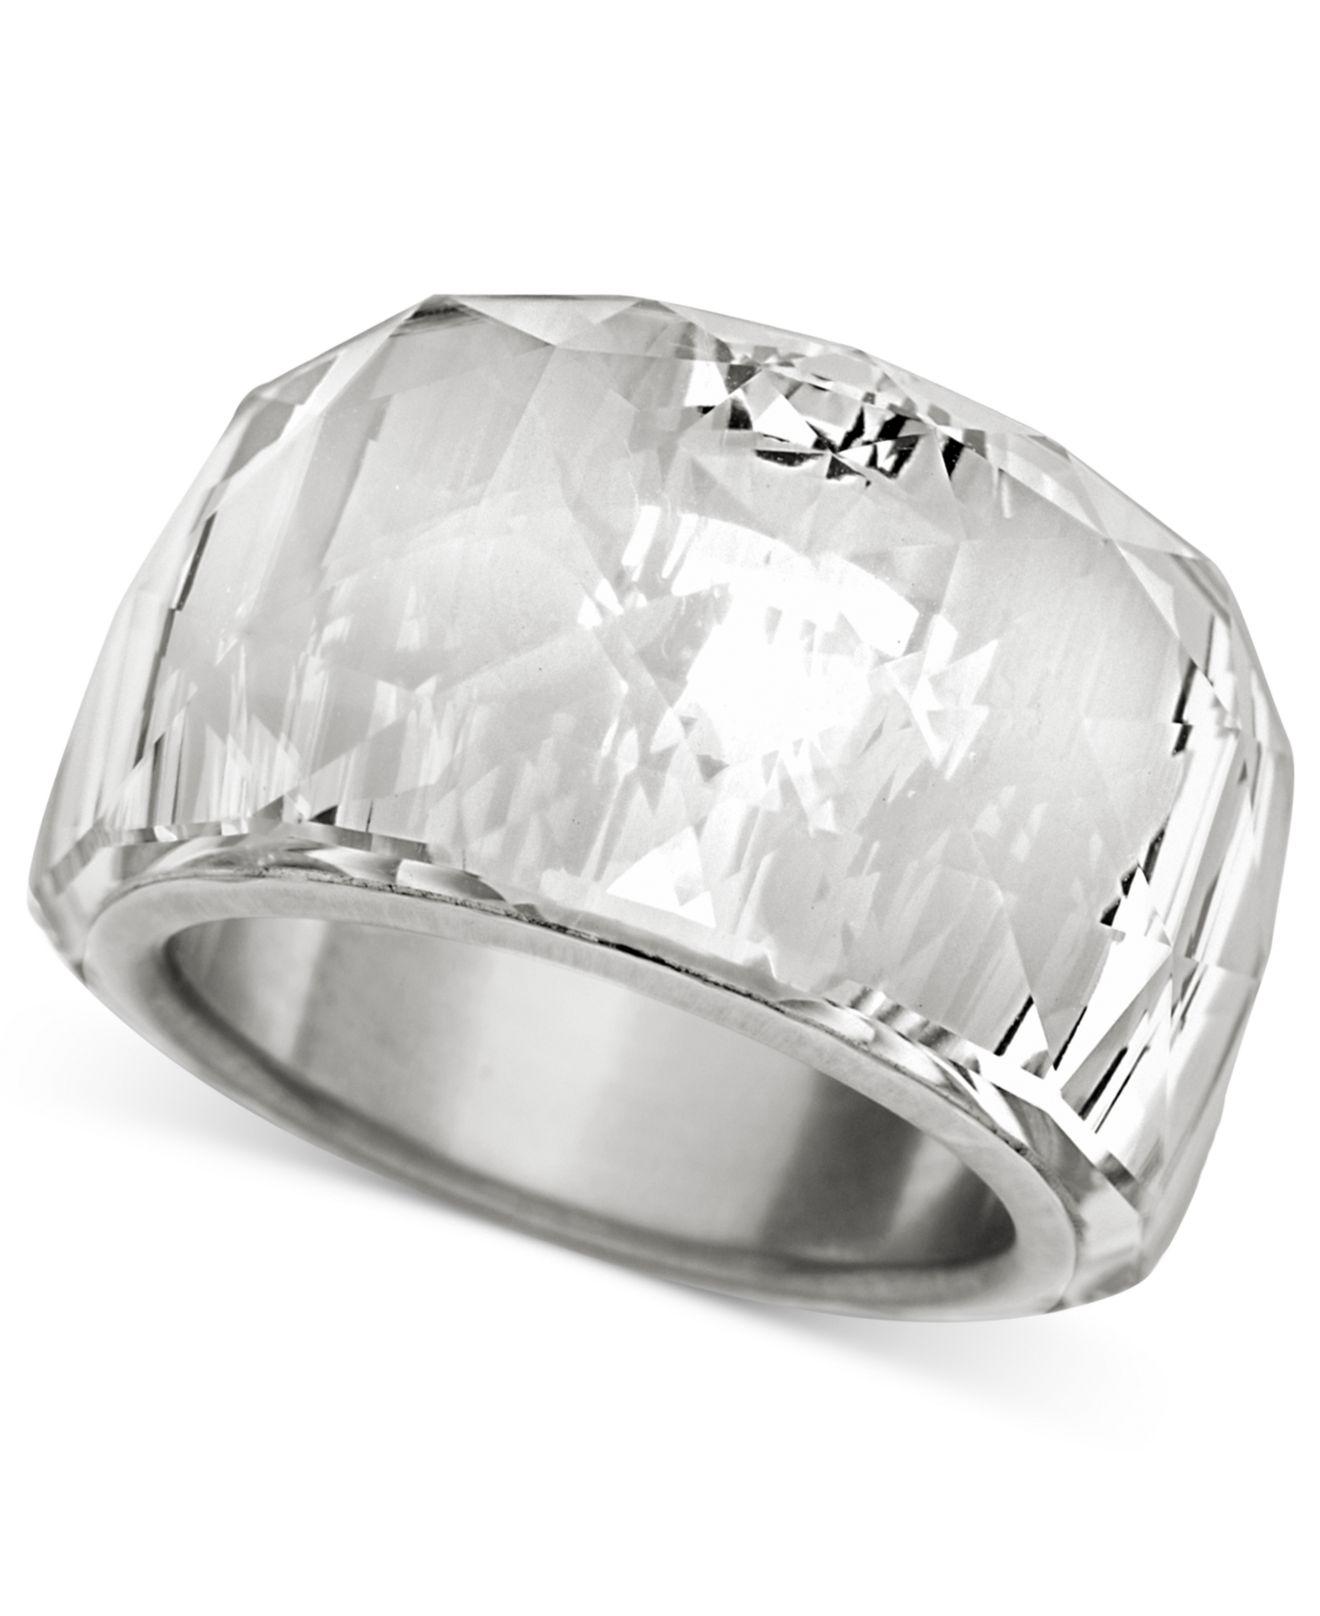 Lyst - Swarovski Crystal Ring in Natural dbaef76d81